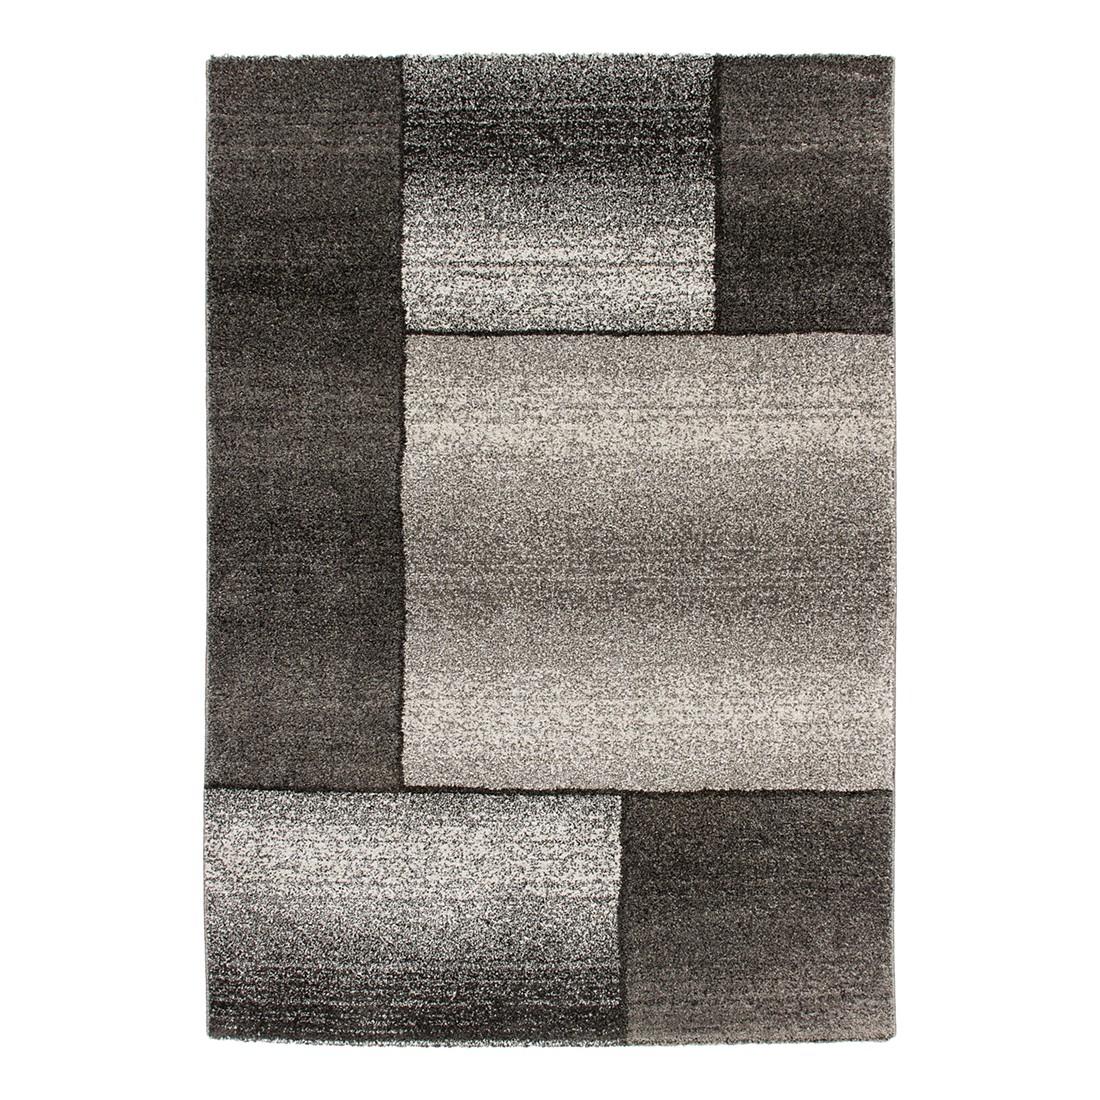 Teppich Kenya – Nakuru – Silber – 200 x 290 cm, Kayoom online kaufen